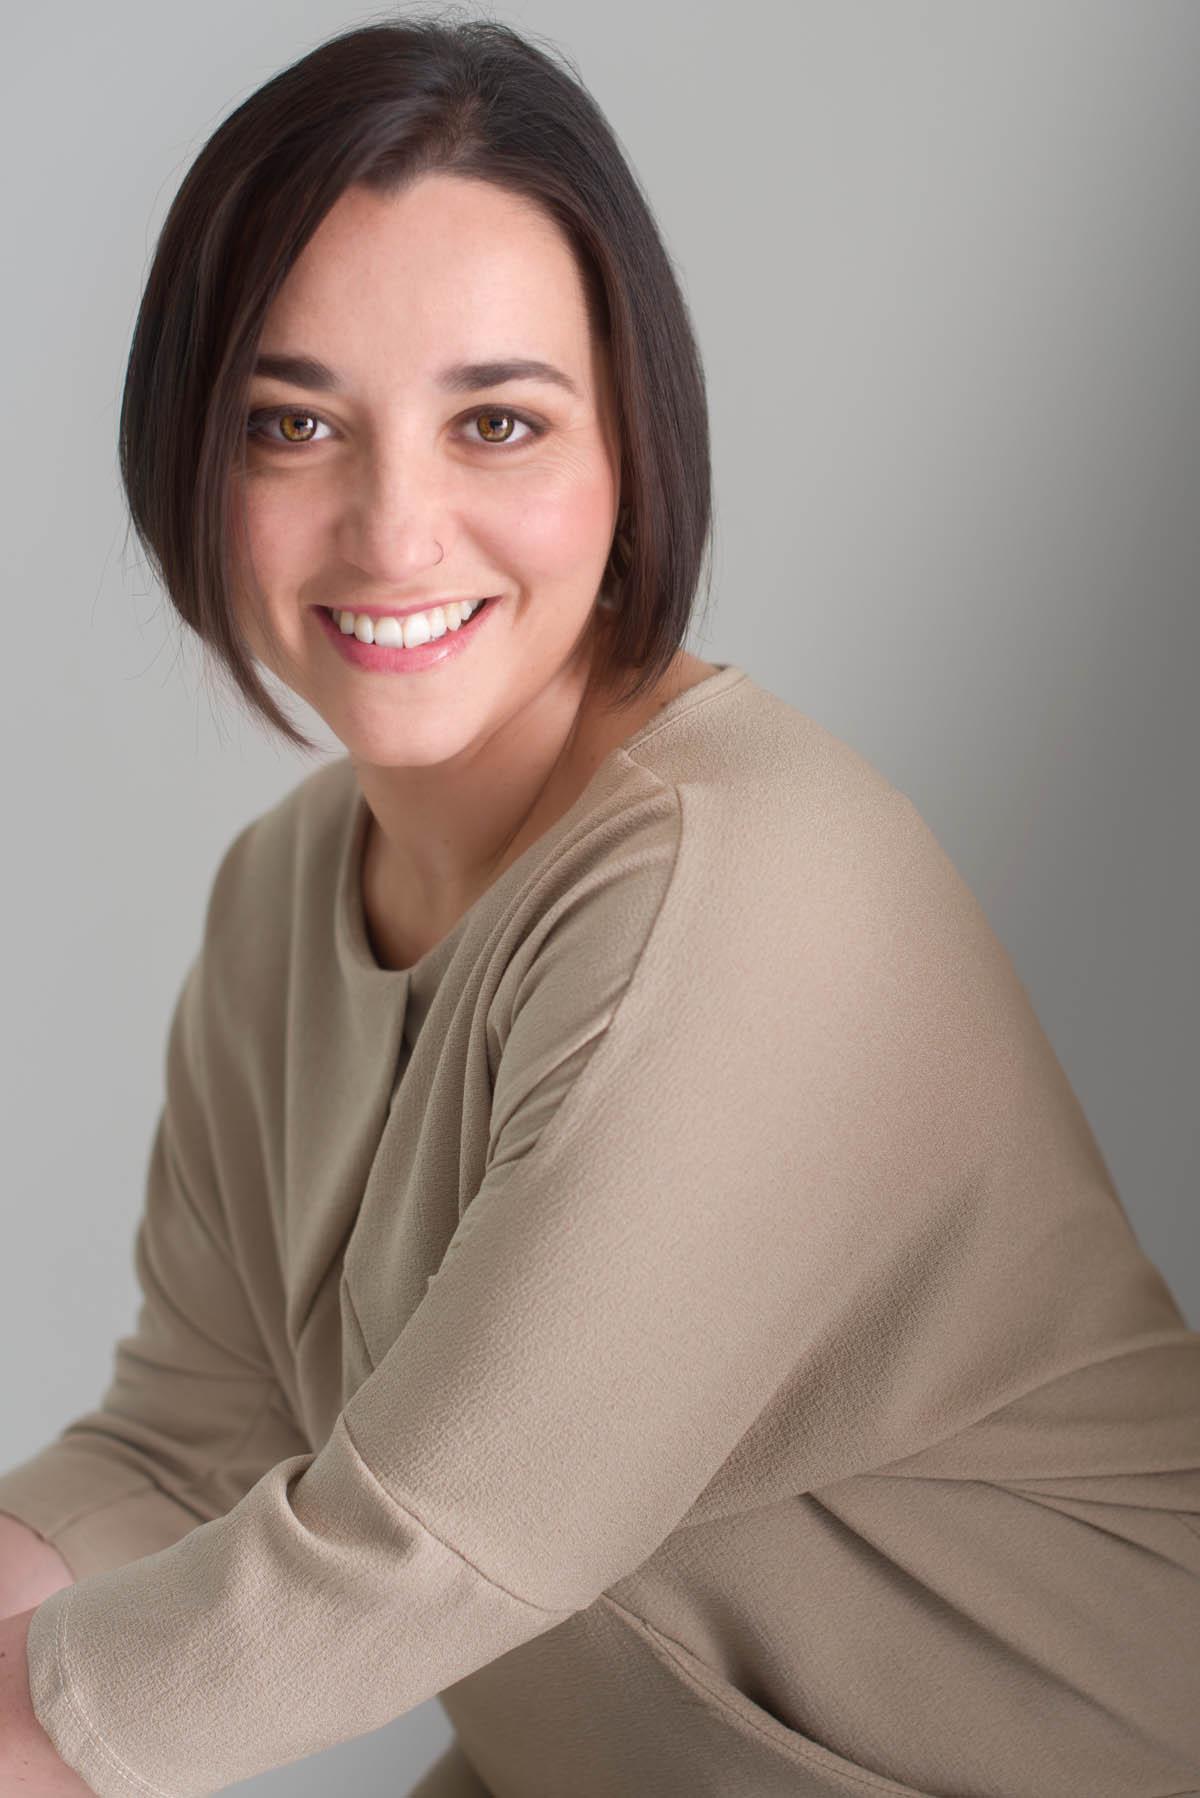 foto cristina calzón